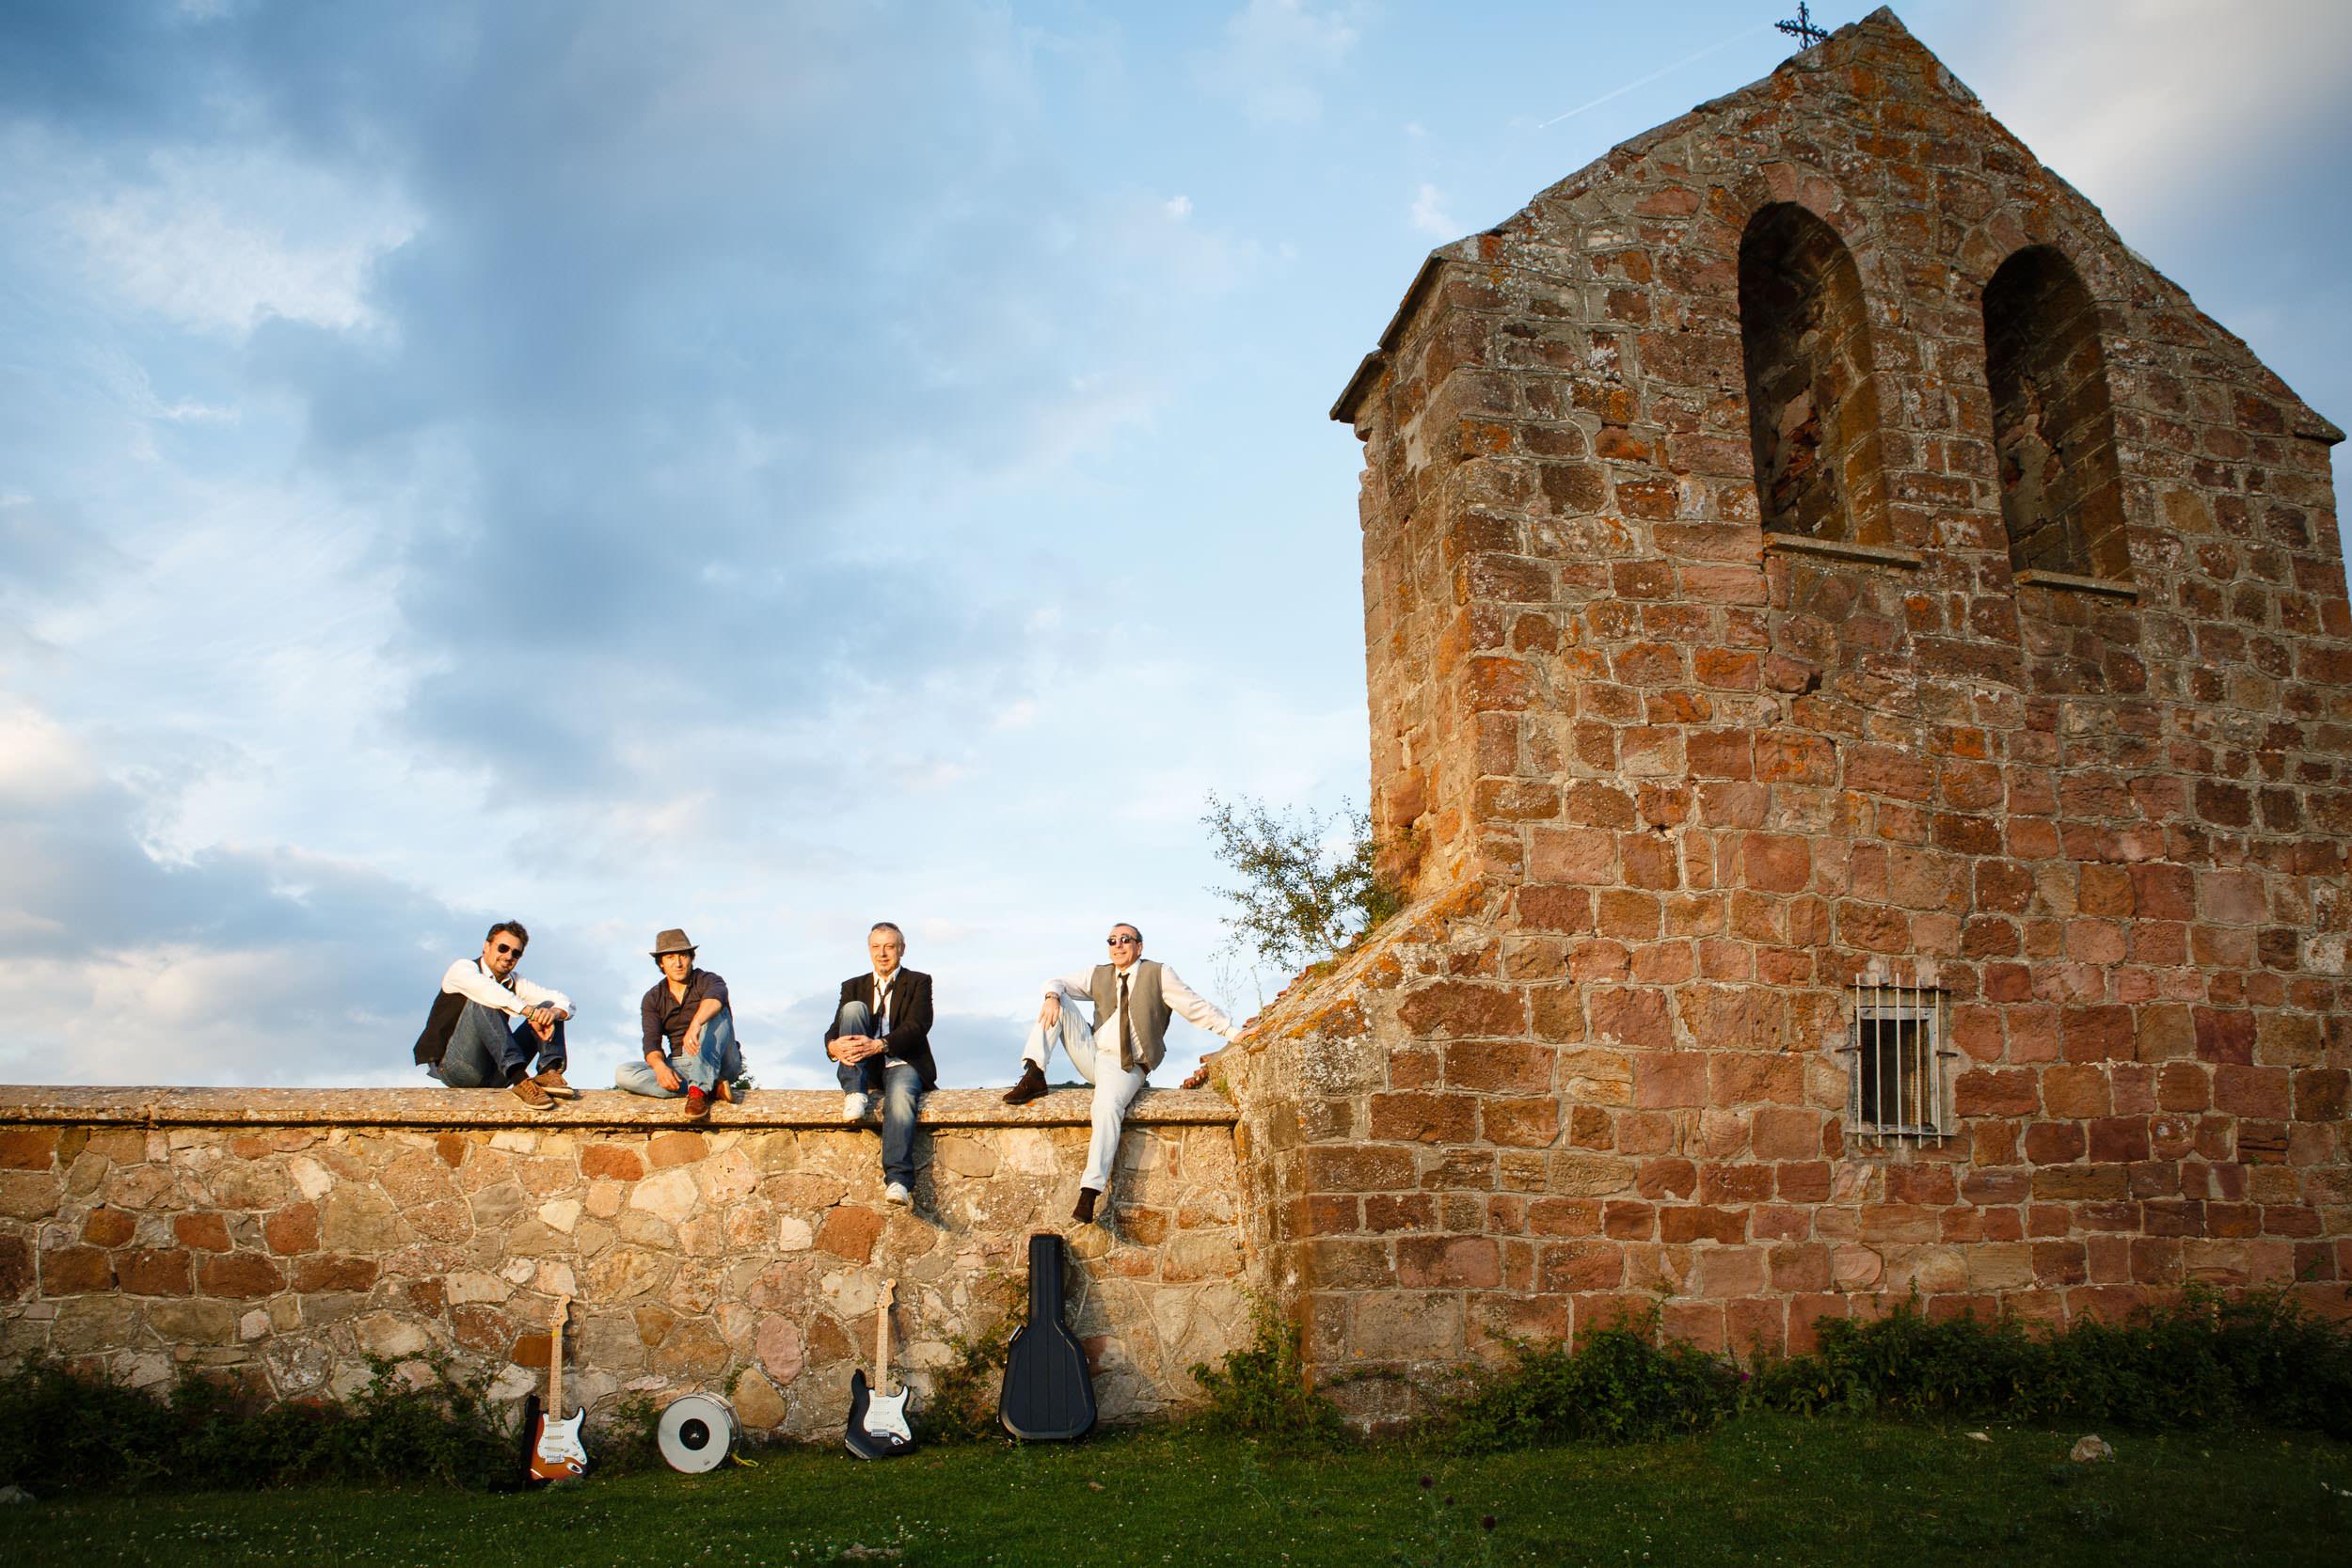 Portrait Photography in La Rioja Basque Country Spain - James Sturcke - sturcke.org_030.jpg